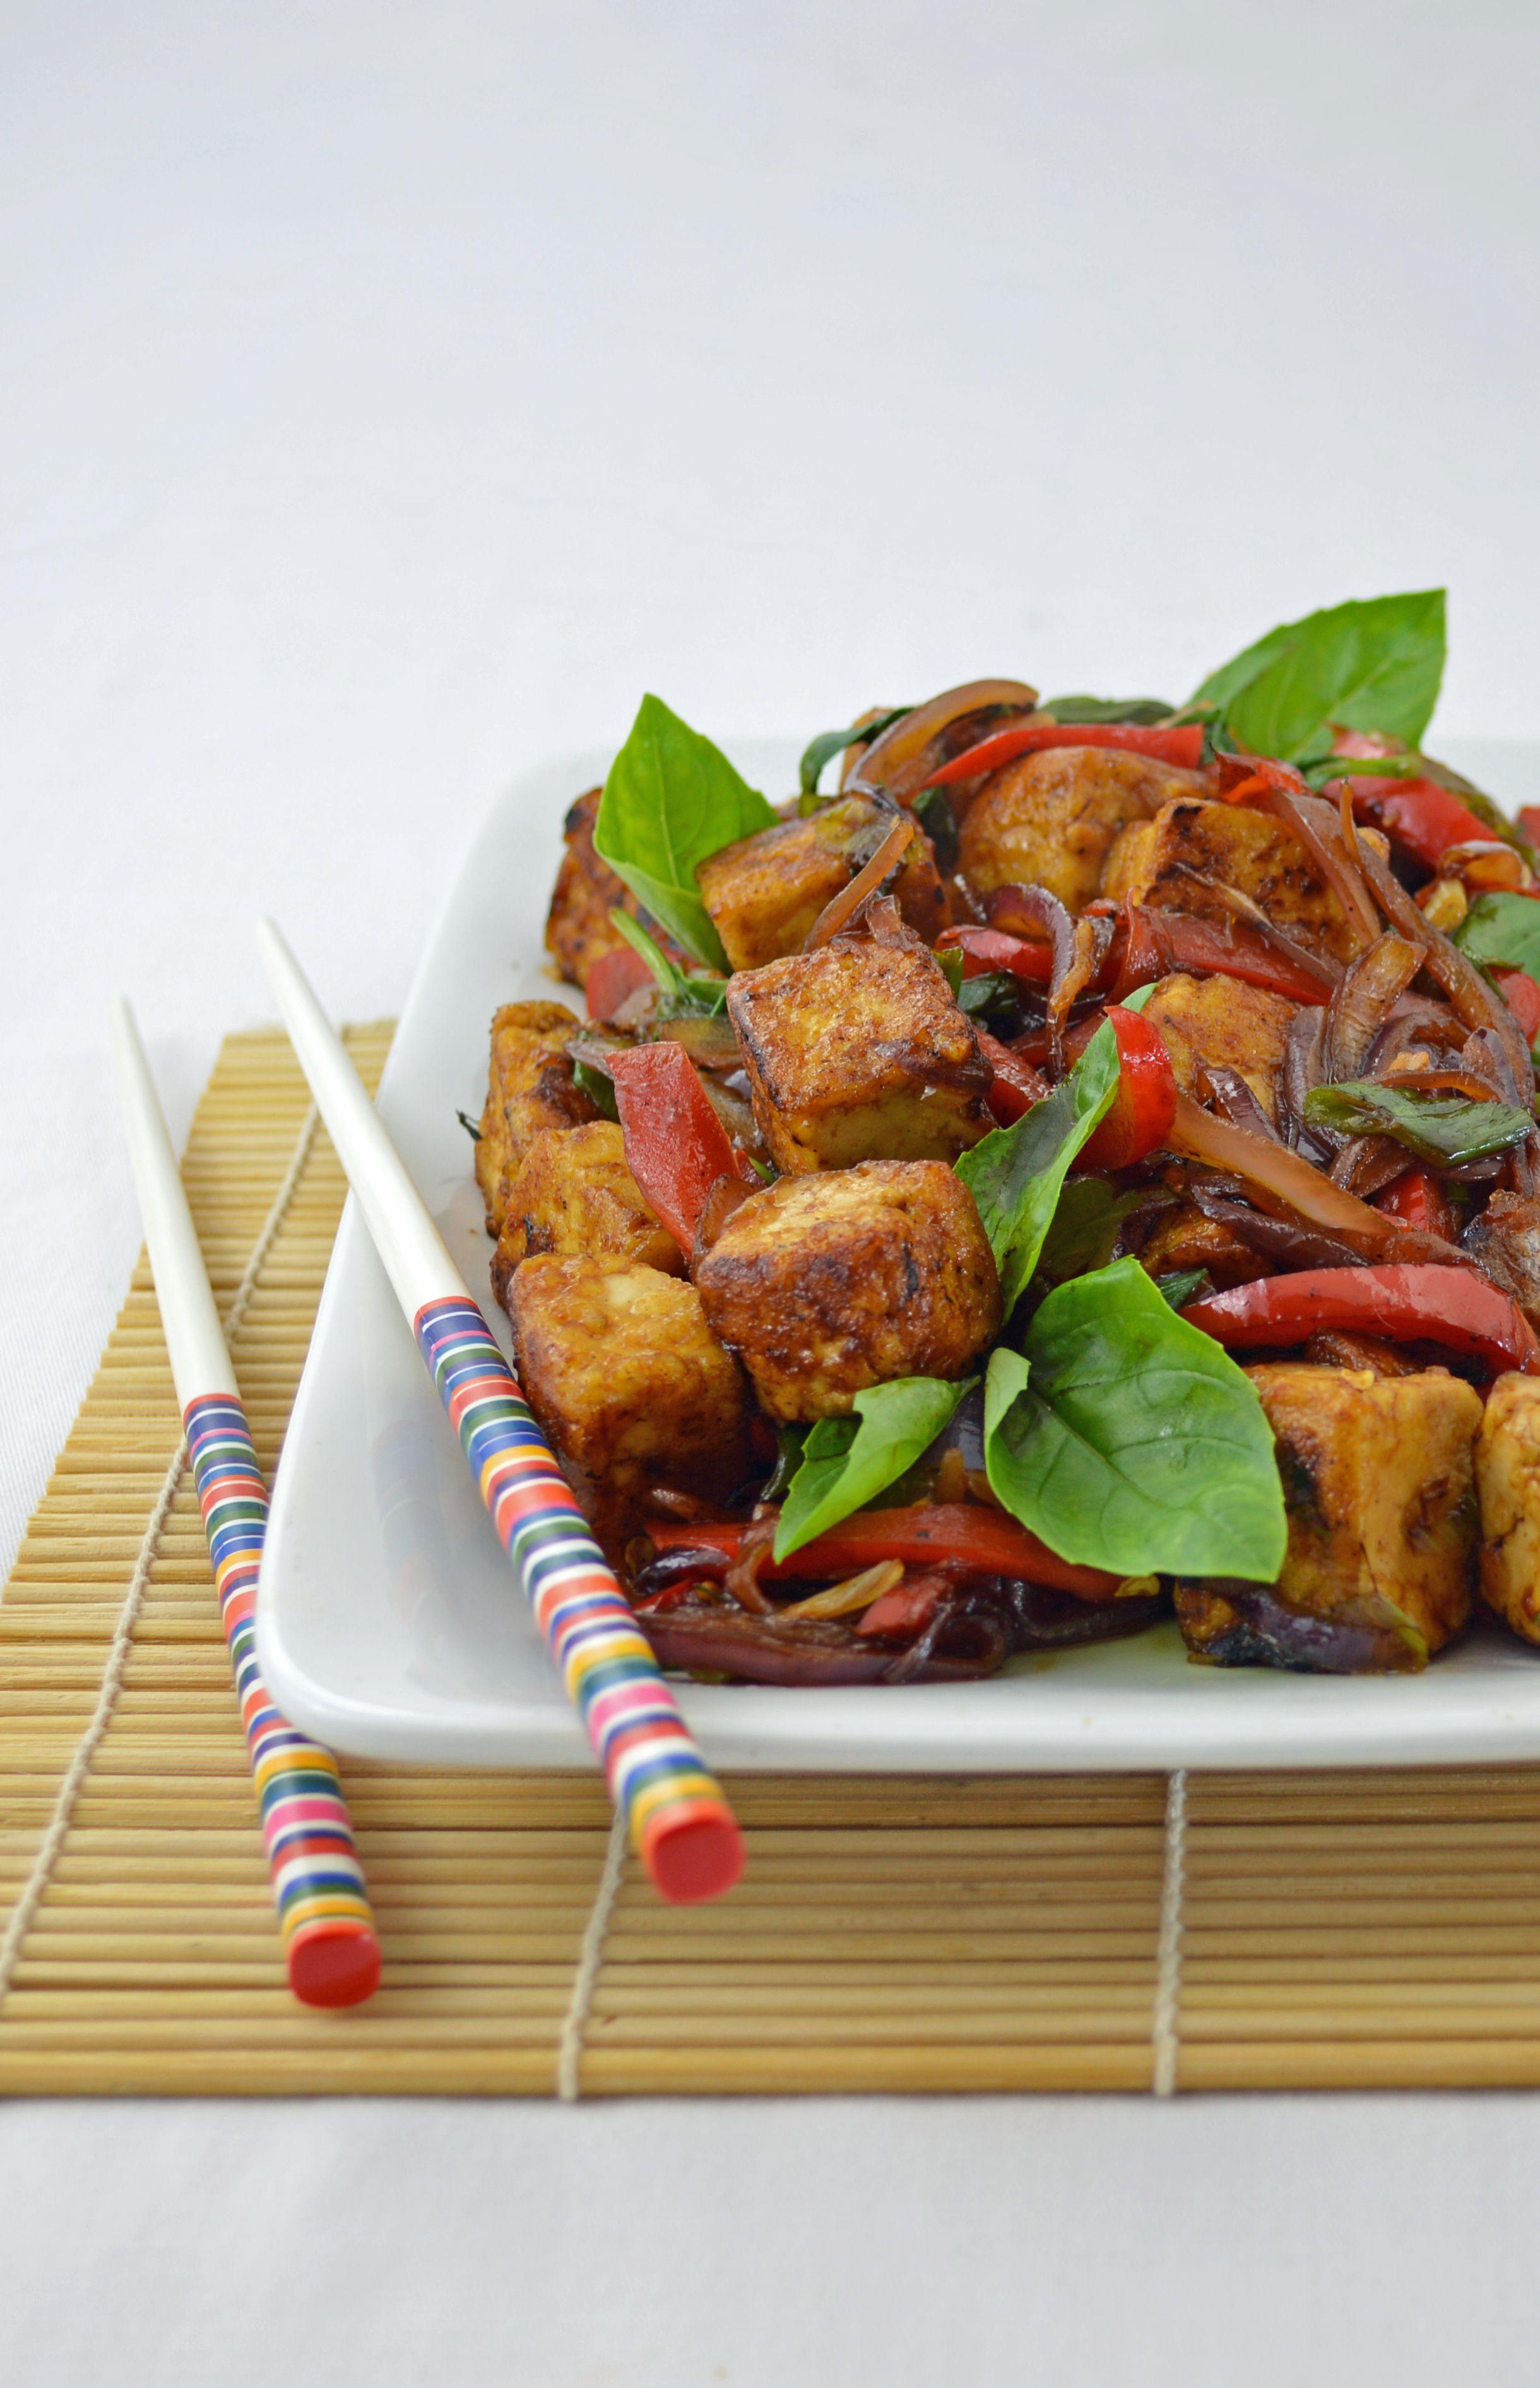 Kapow Tofu From 100 Best Vegan Recipes By Robin Robertson